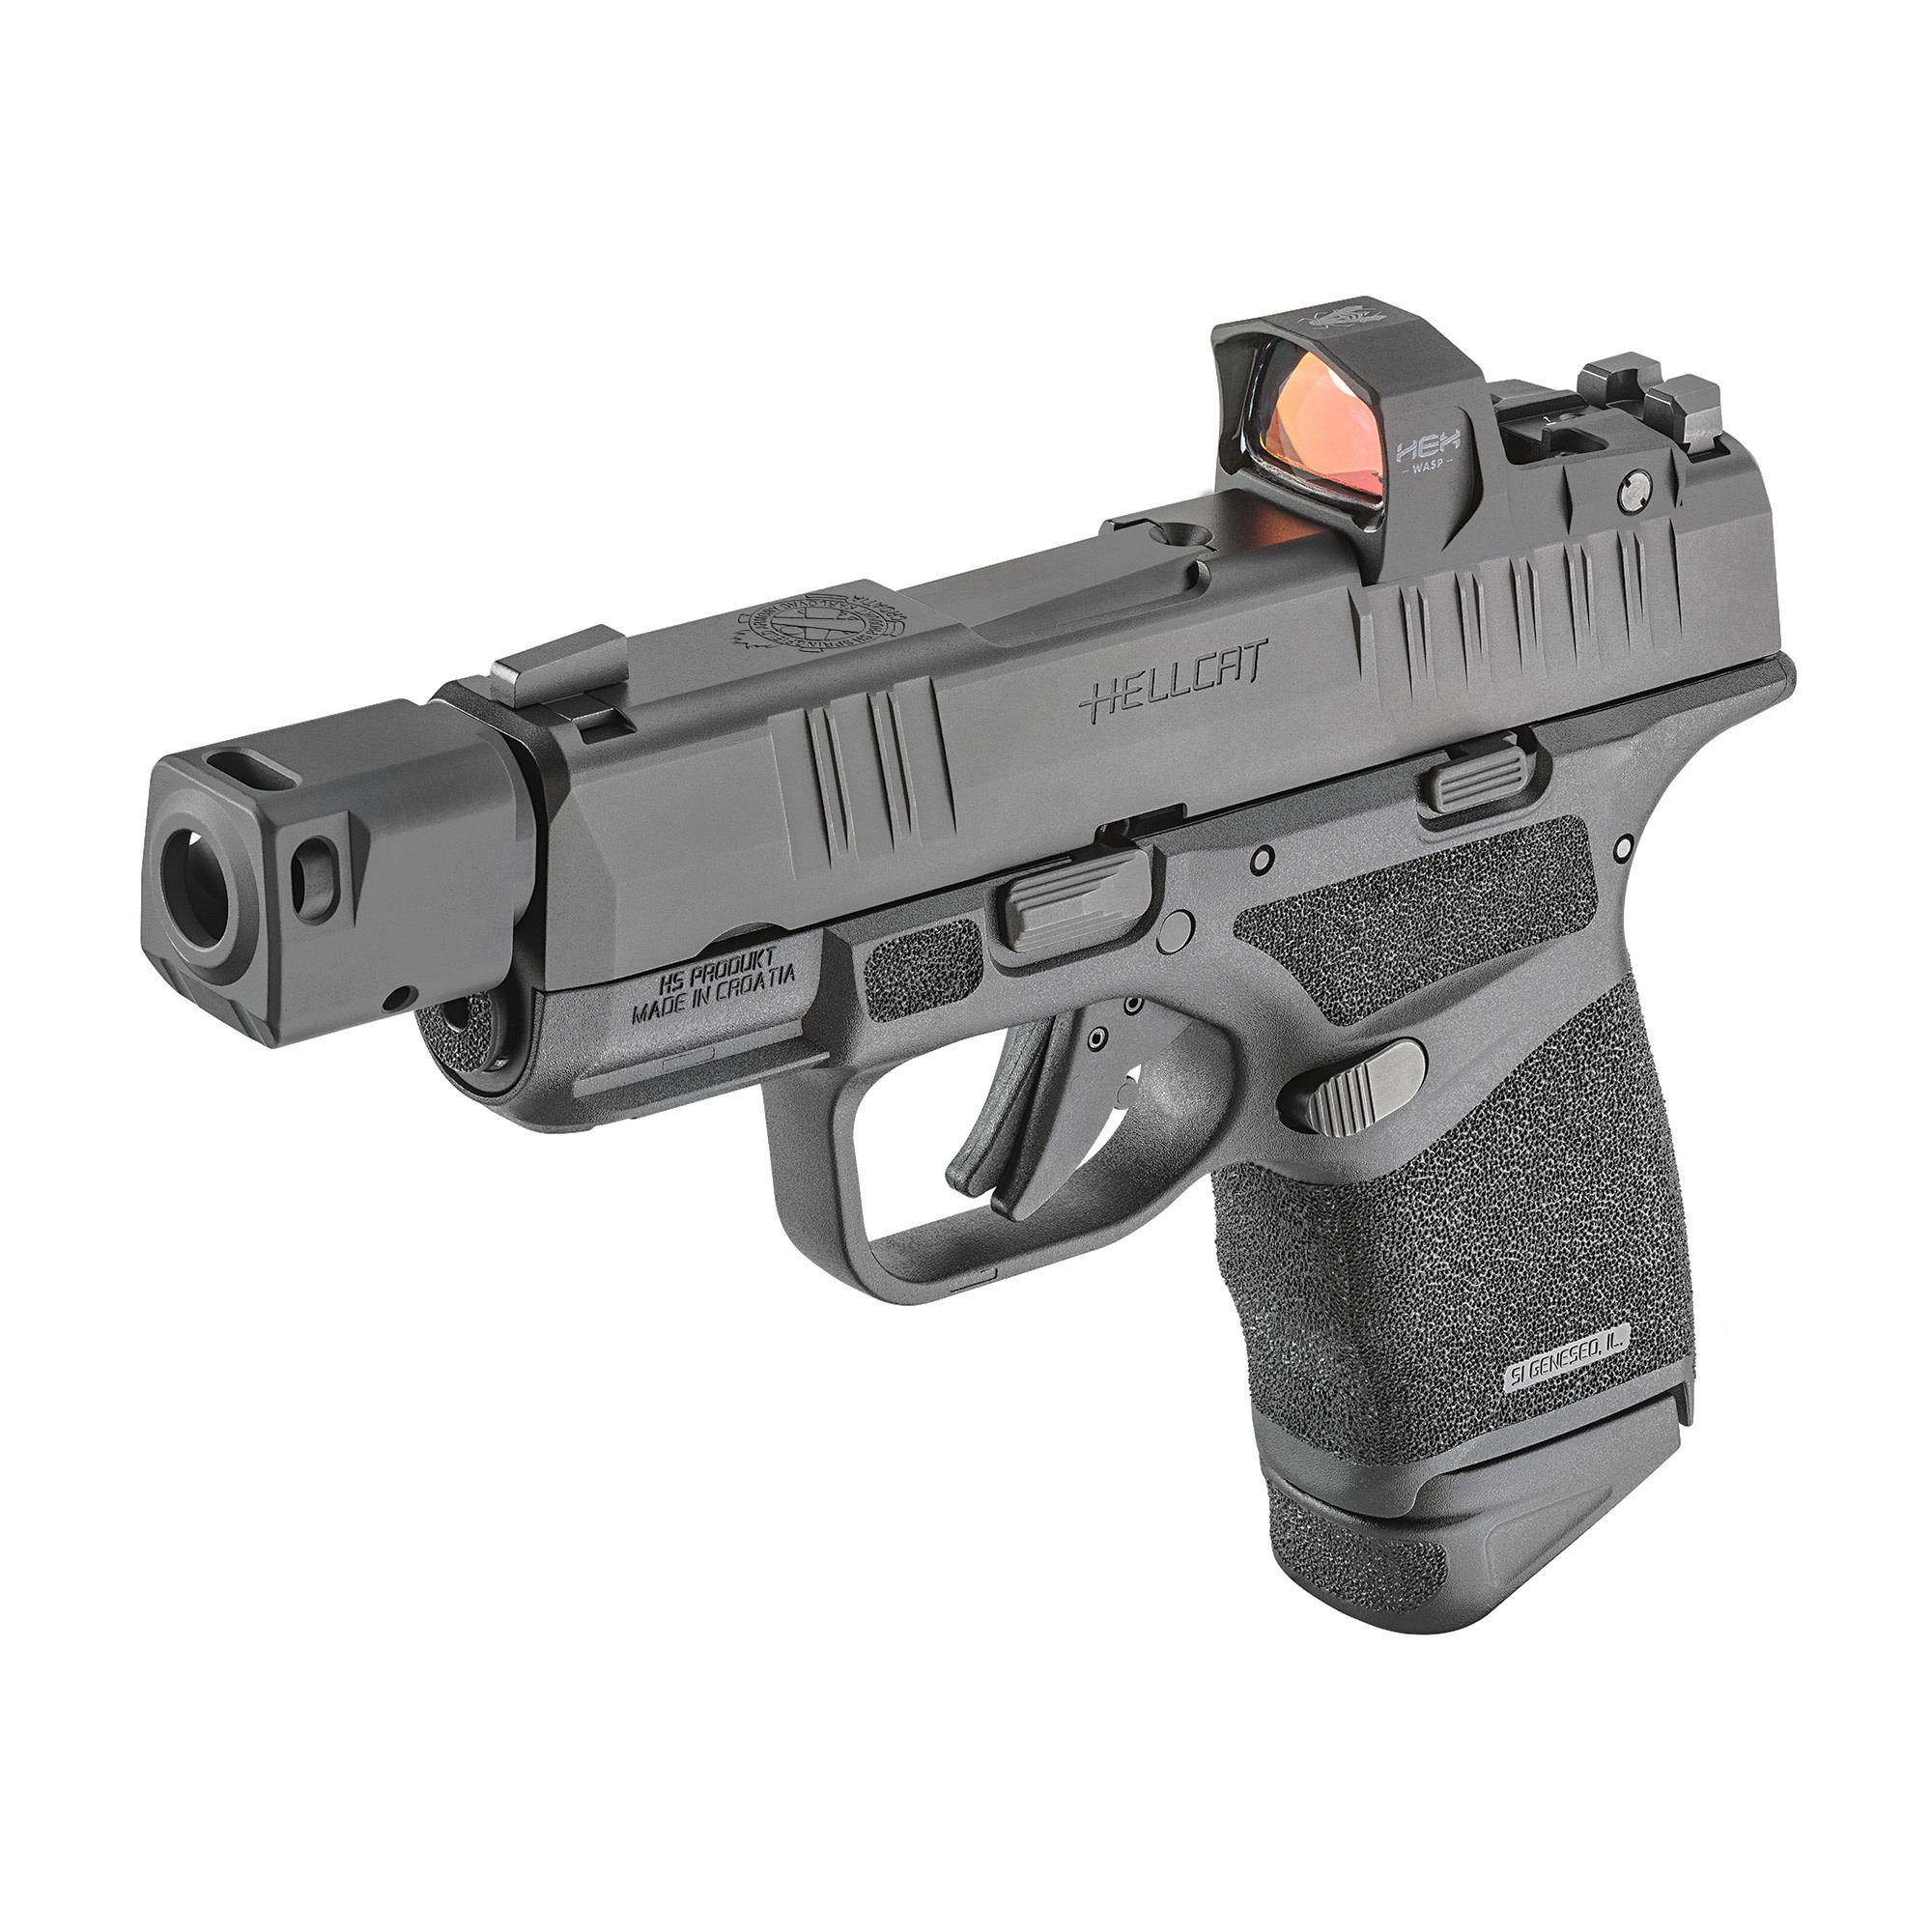 "Springfield Hellcat RDP, Optics Ready, 9mm, 3.8"" Barrel w/ Compensator, Night Sights, 2 Mags, 13Rd, Black, Includes HEX Wasp Red Dot"